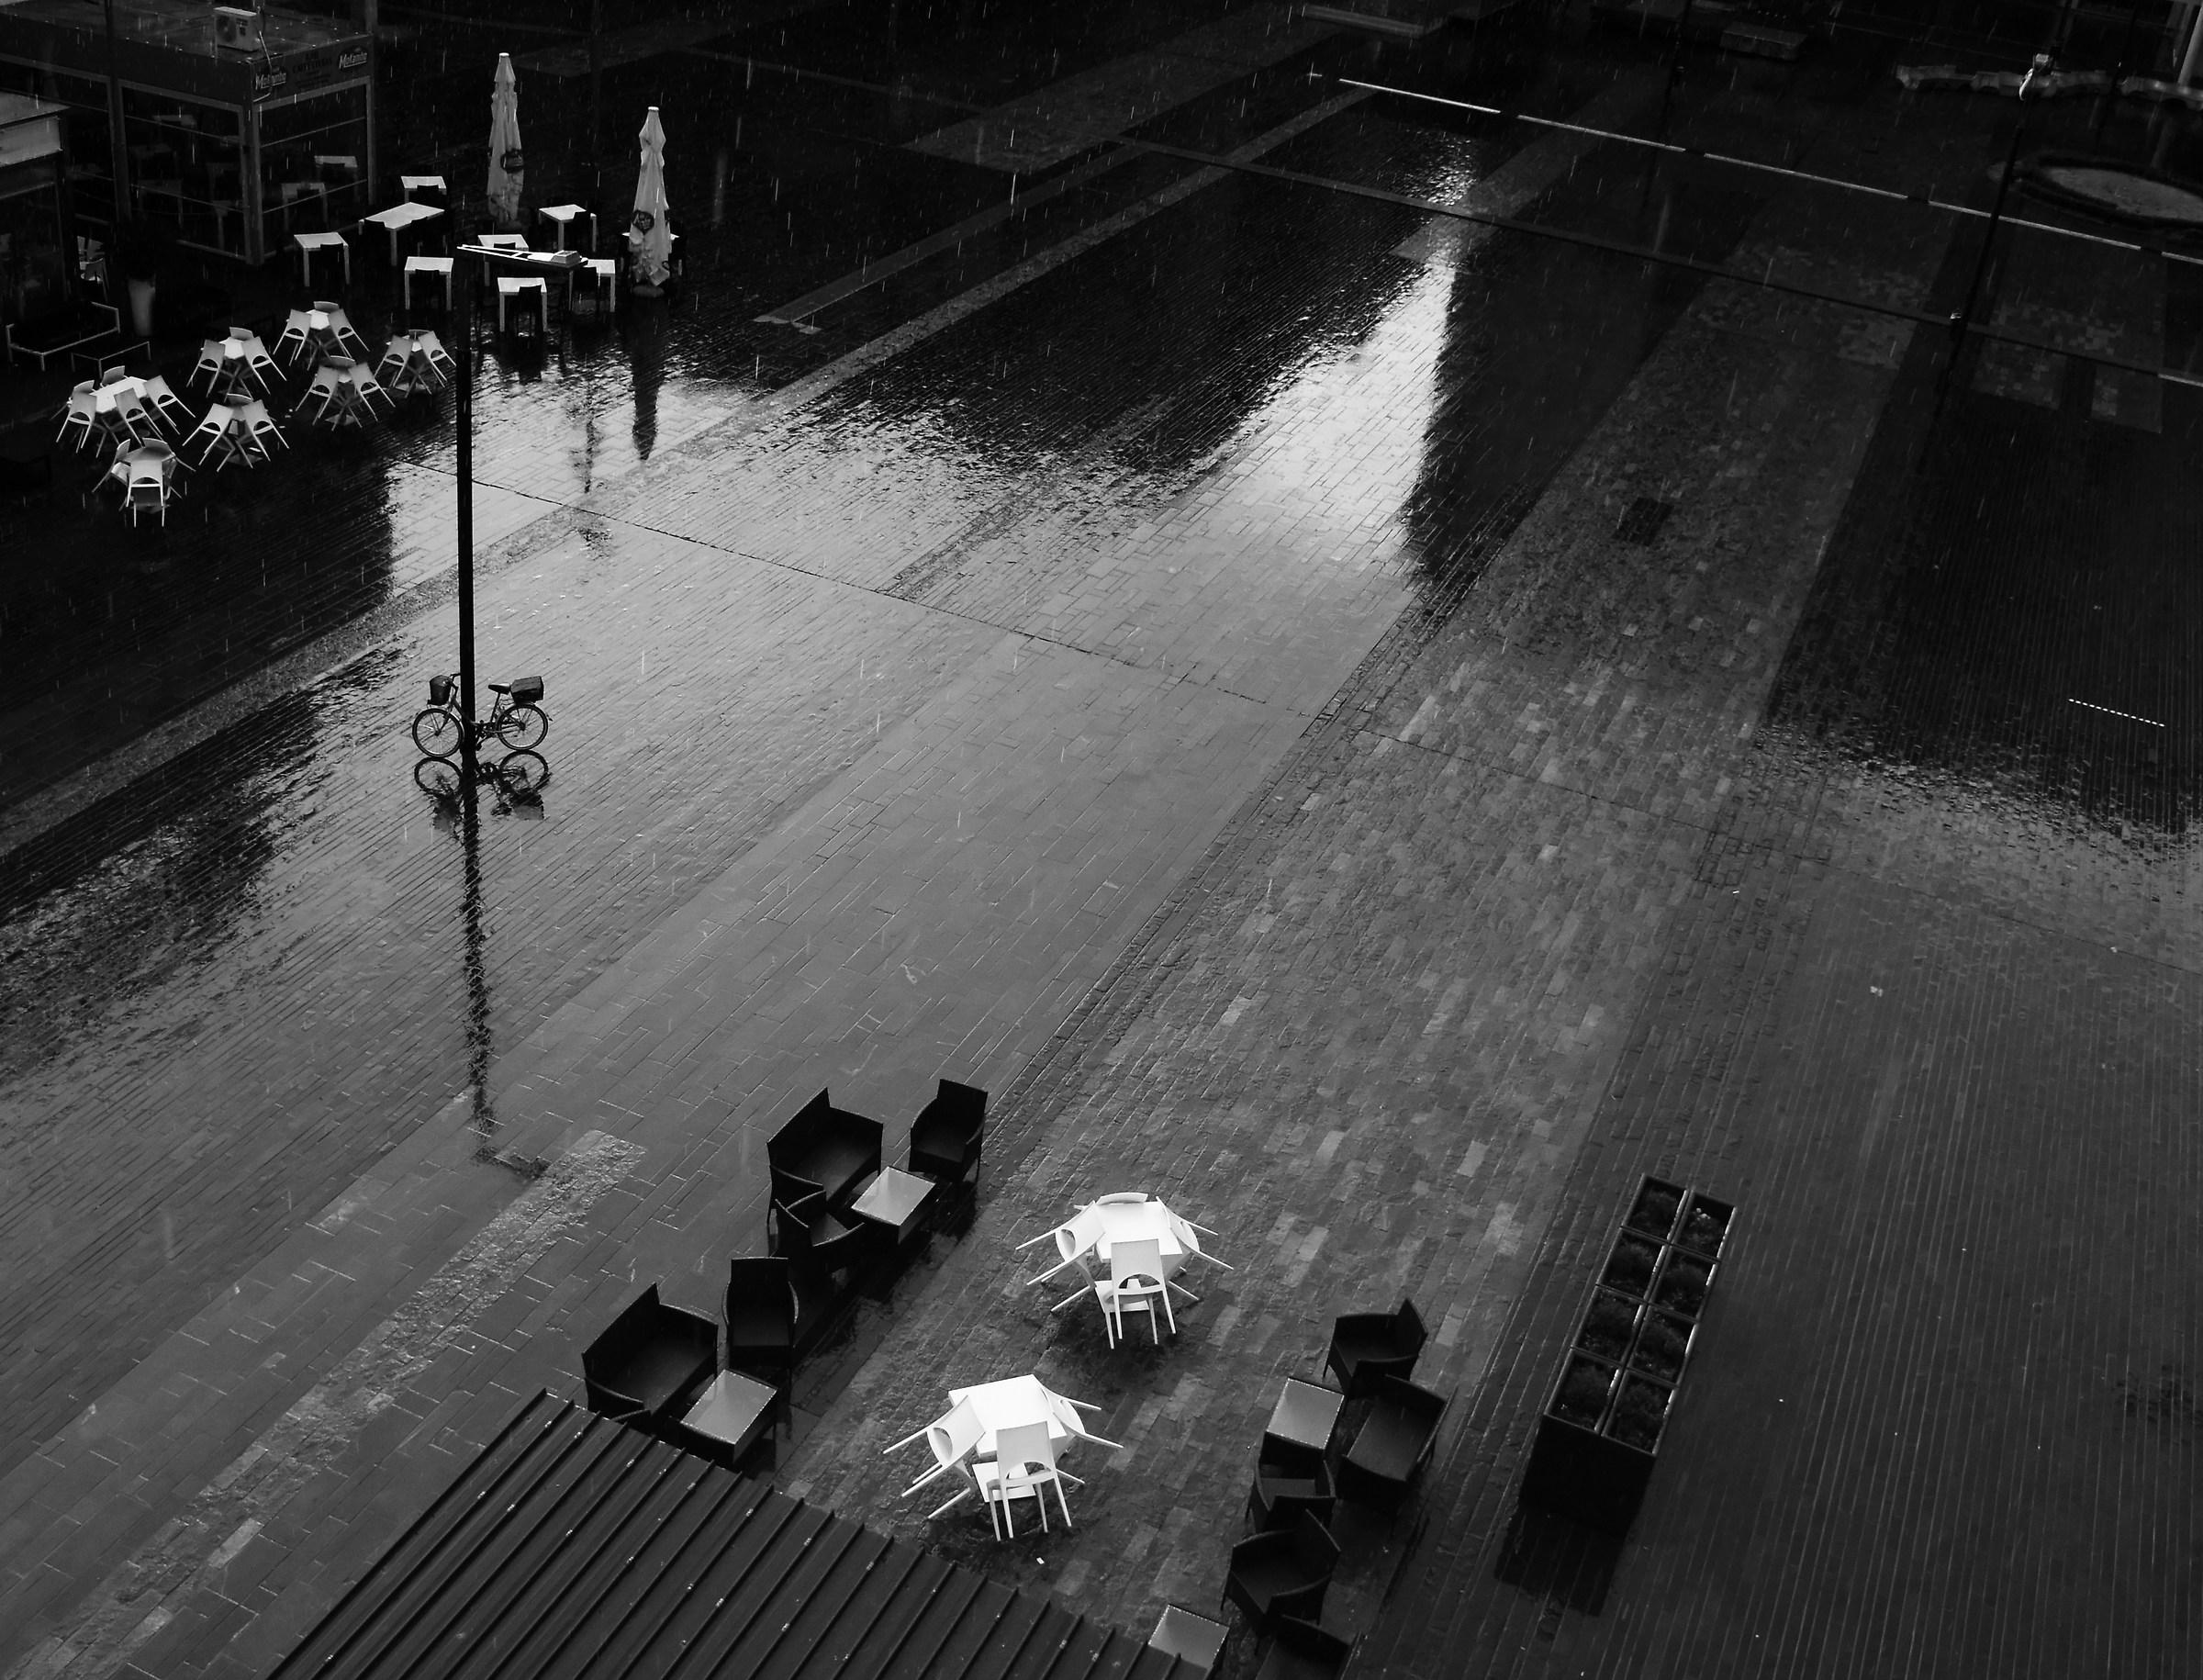 It rains on the fairy tale...